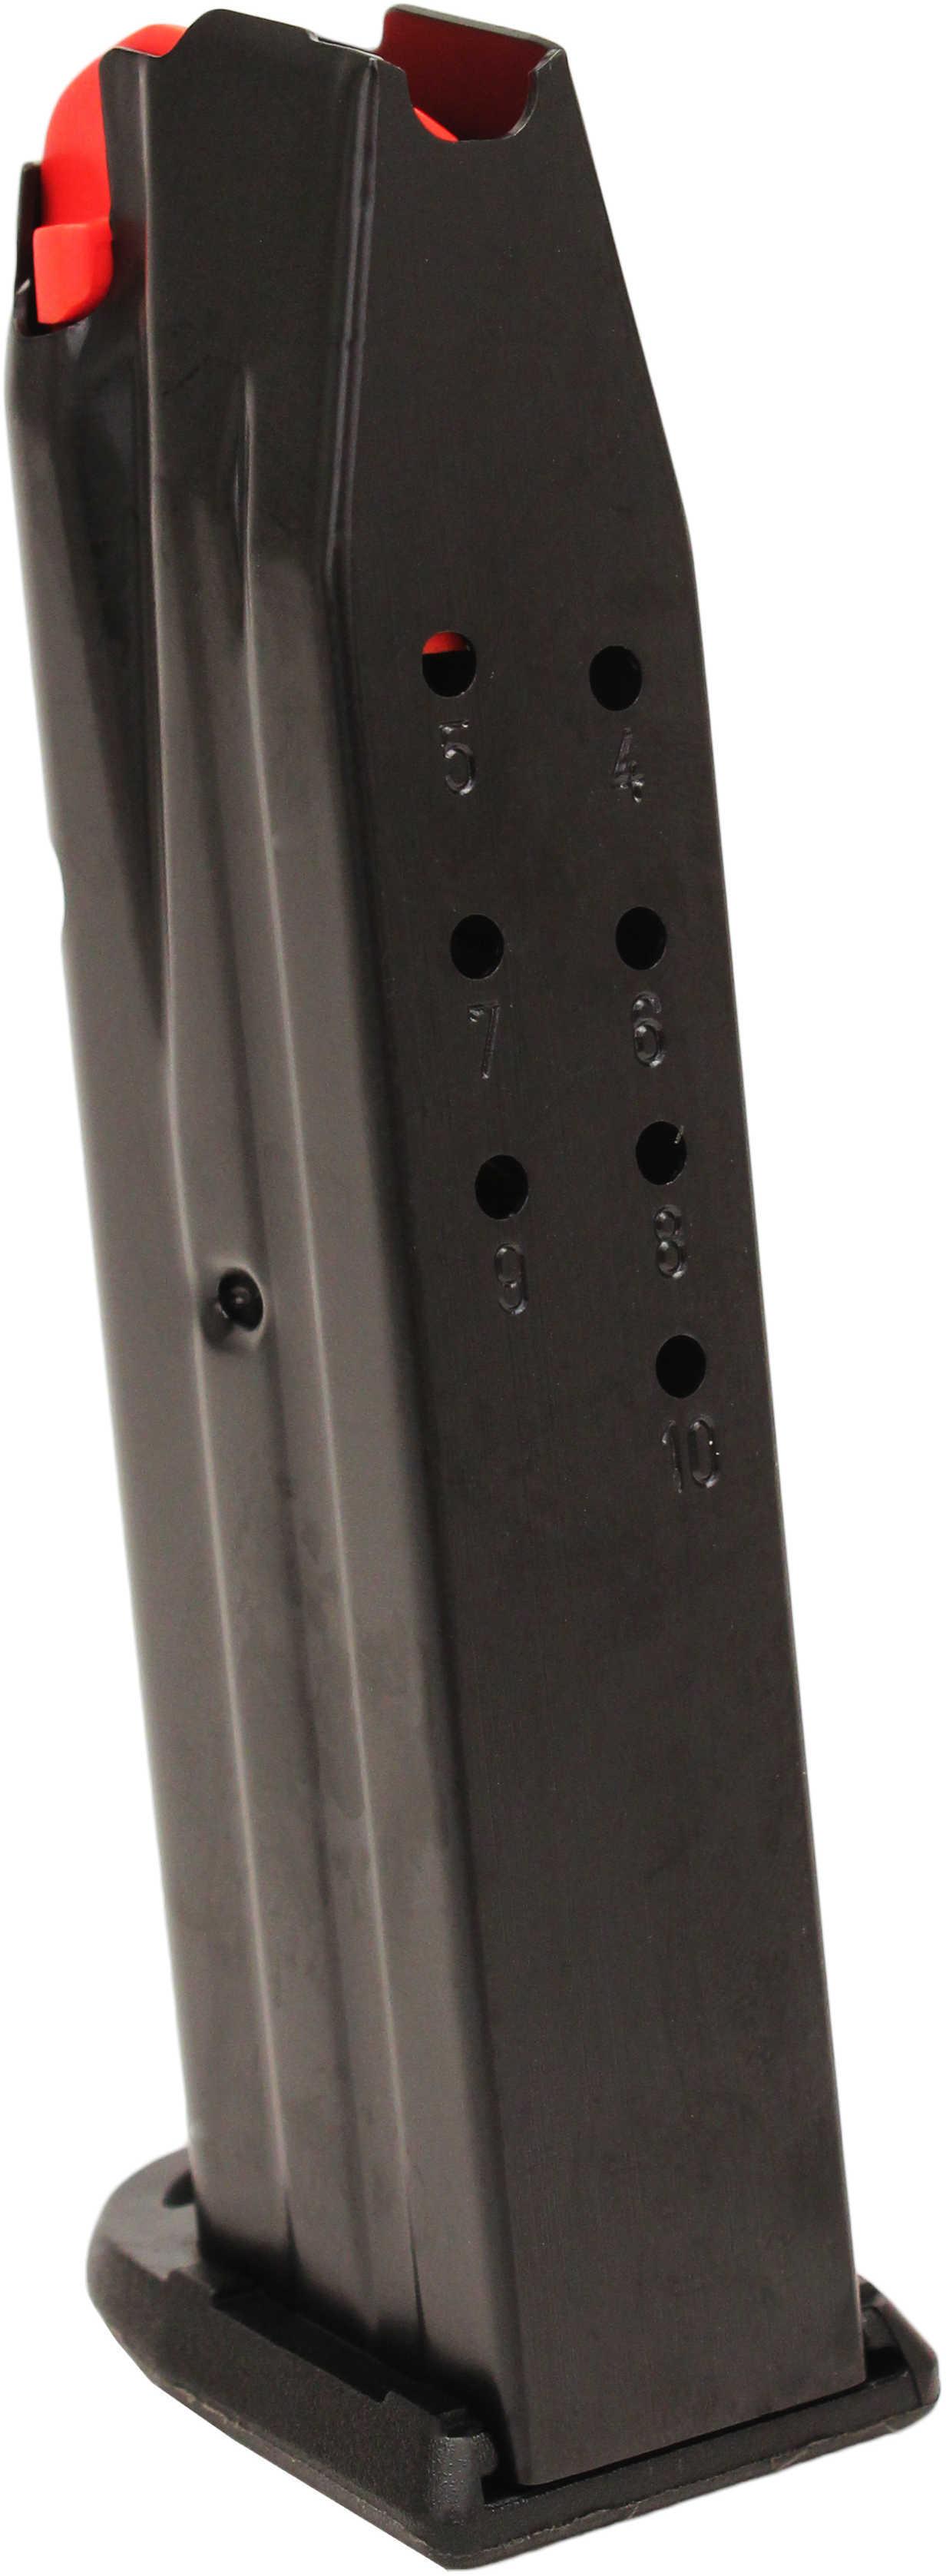 Walther PPQ M2 9mm Magazine 10 Round Md: 2796651